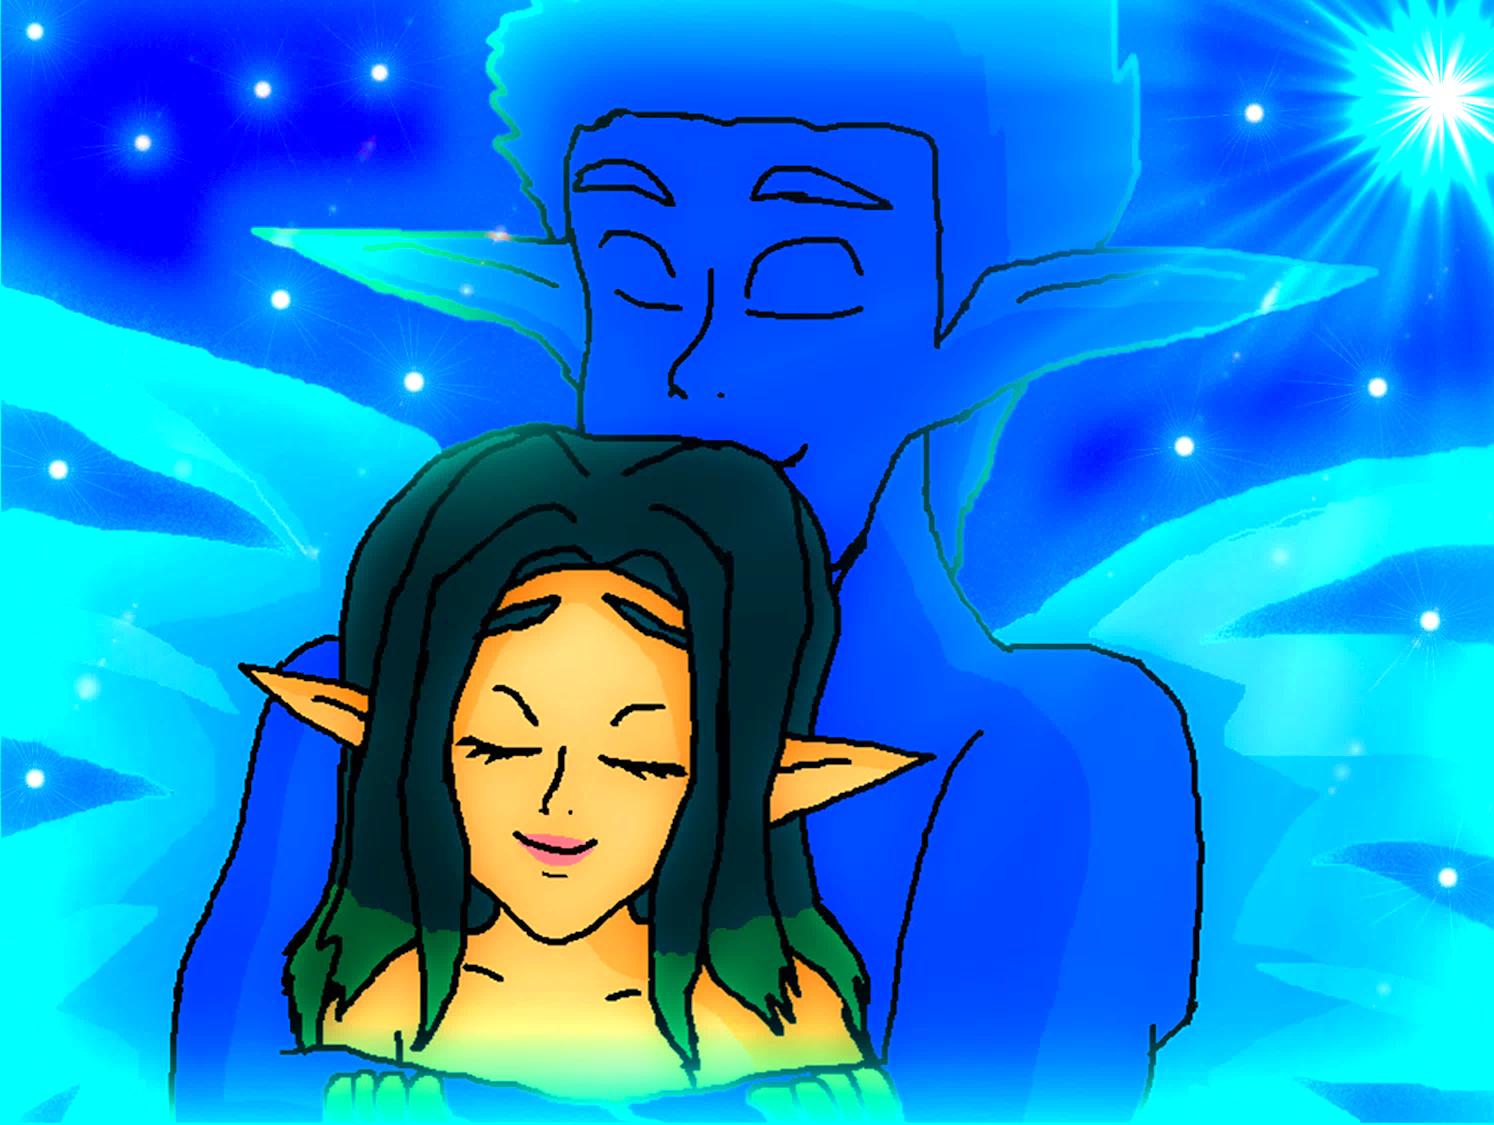 Light Jak And Keira Hagai Feel Warm Hug Jak And Daxter Fan Art 40078741 Fanpop